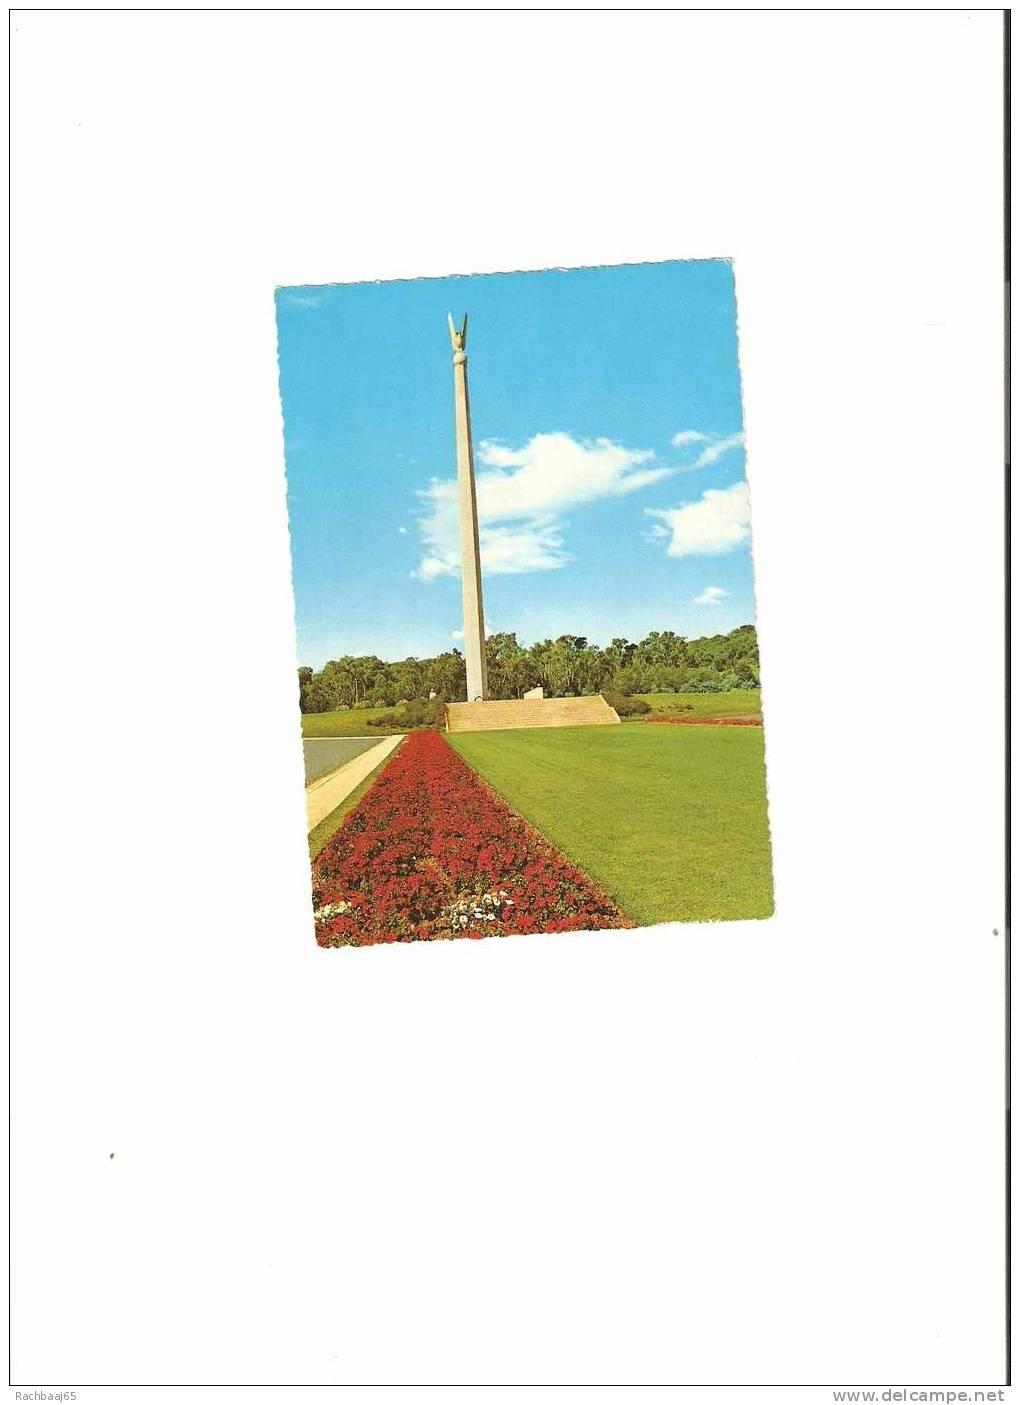 MEMORIAL ,CANBERRA GUERREAMERICAN - Canberra (ACT)